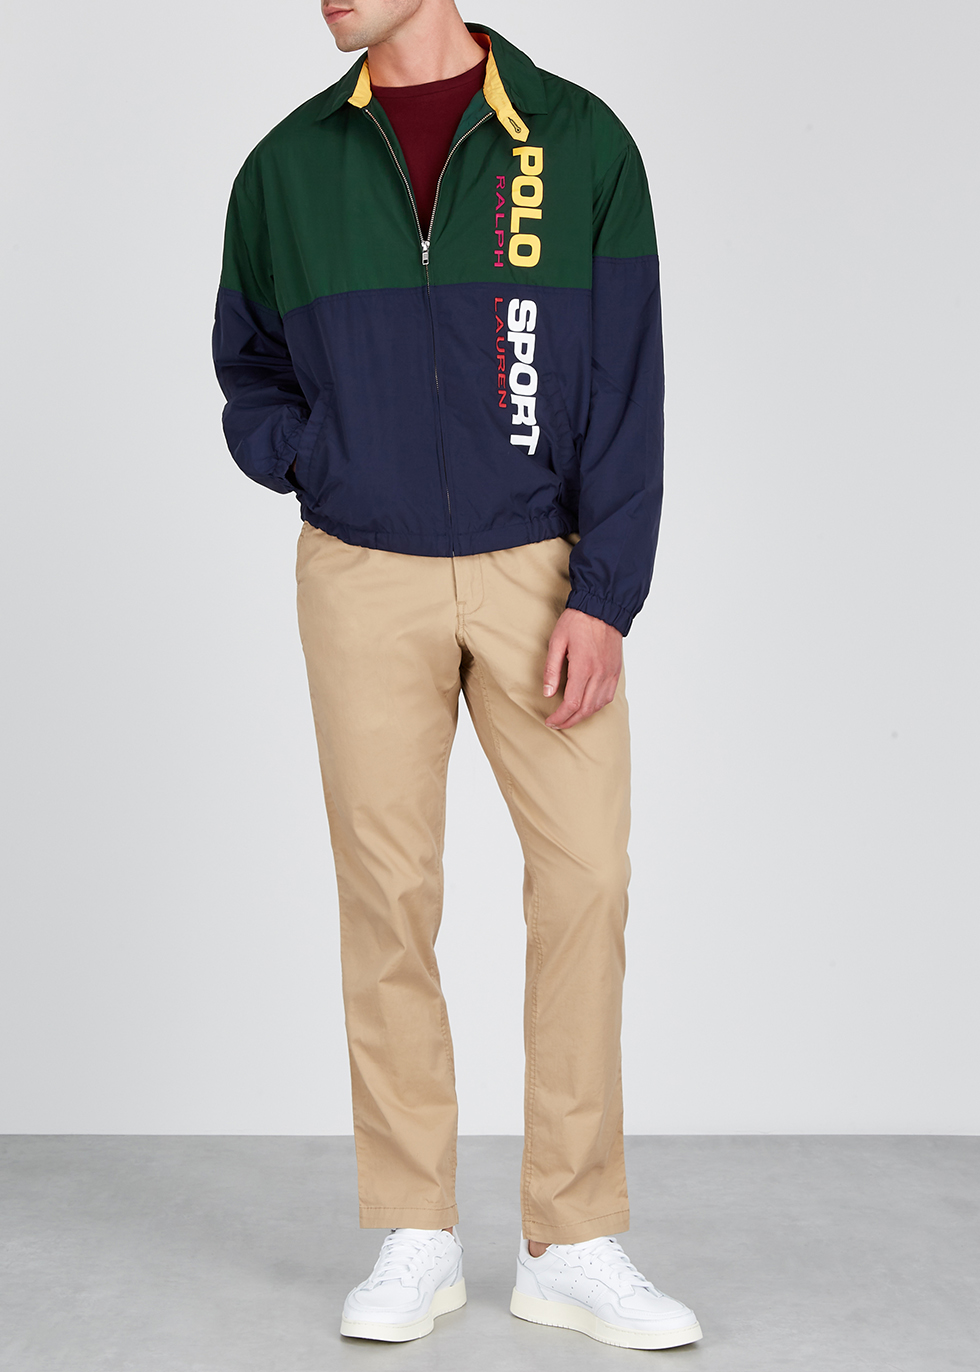 57c3f9f2 Polo Ralph Lauren Polo Shirts, T-Shirts, Jumpers - Harvey Nichols